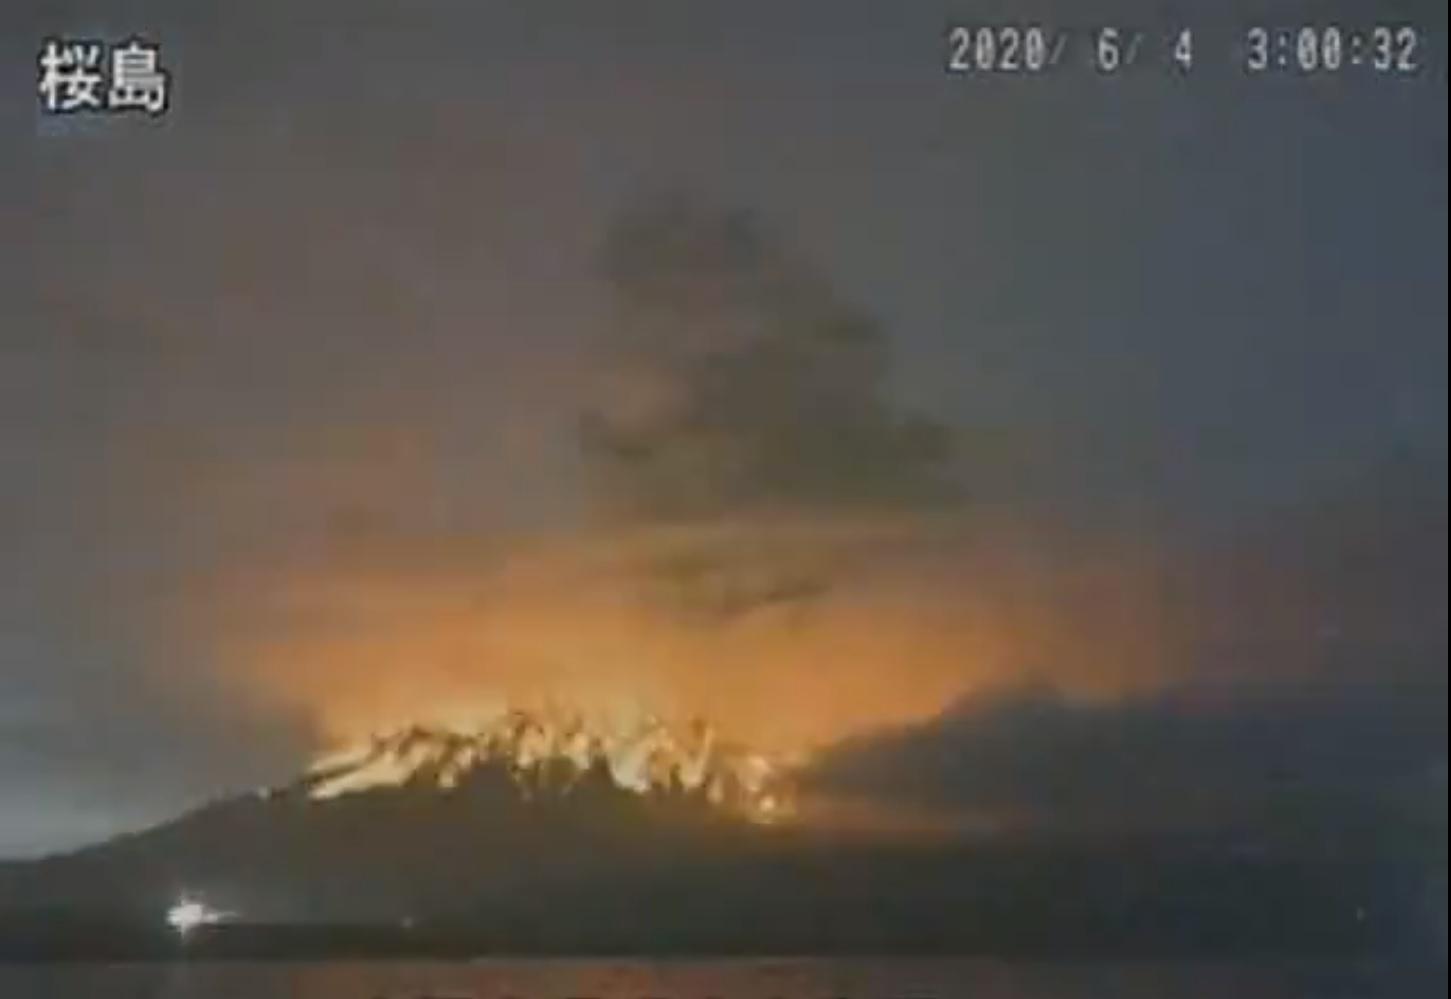 Glow generated by incandescent material from Sakurajima volcano today (image: @VolcanoYTz/twitter)